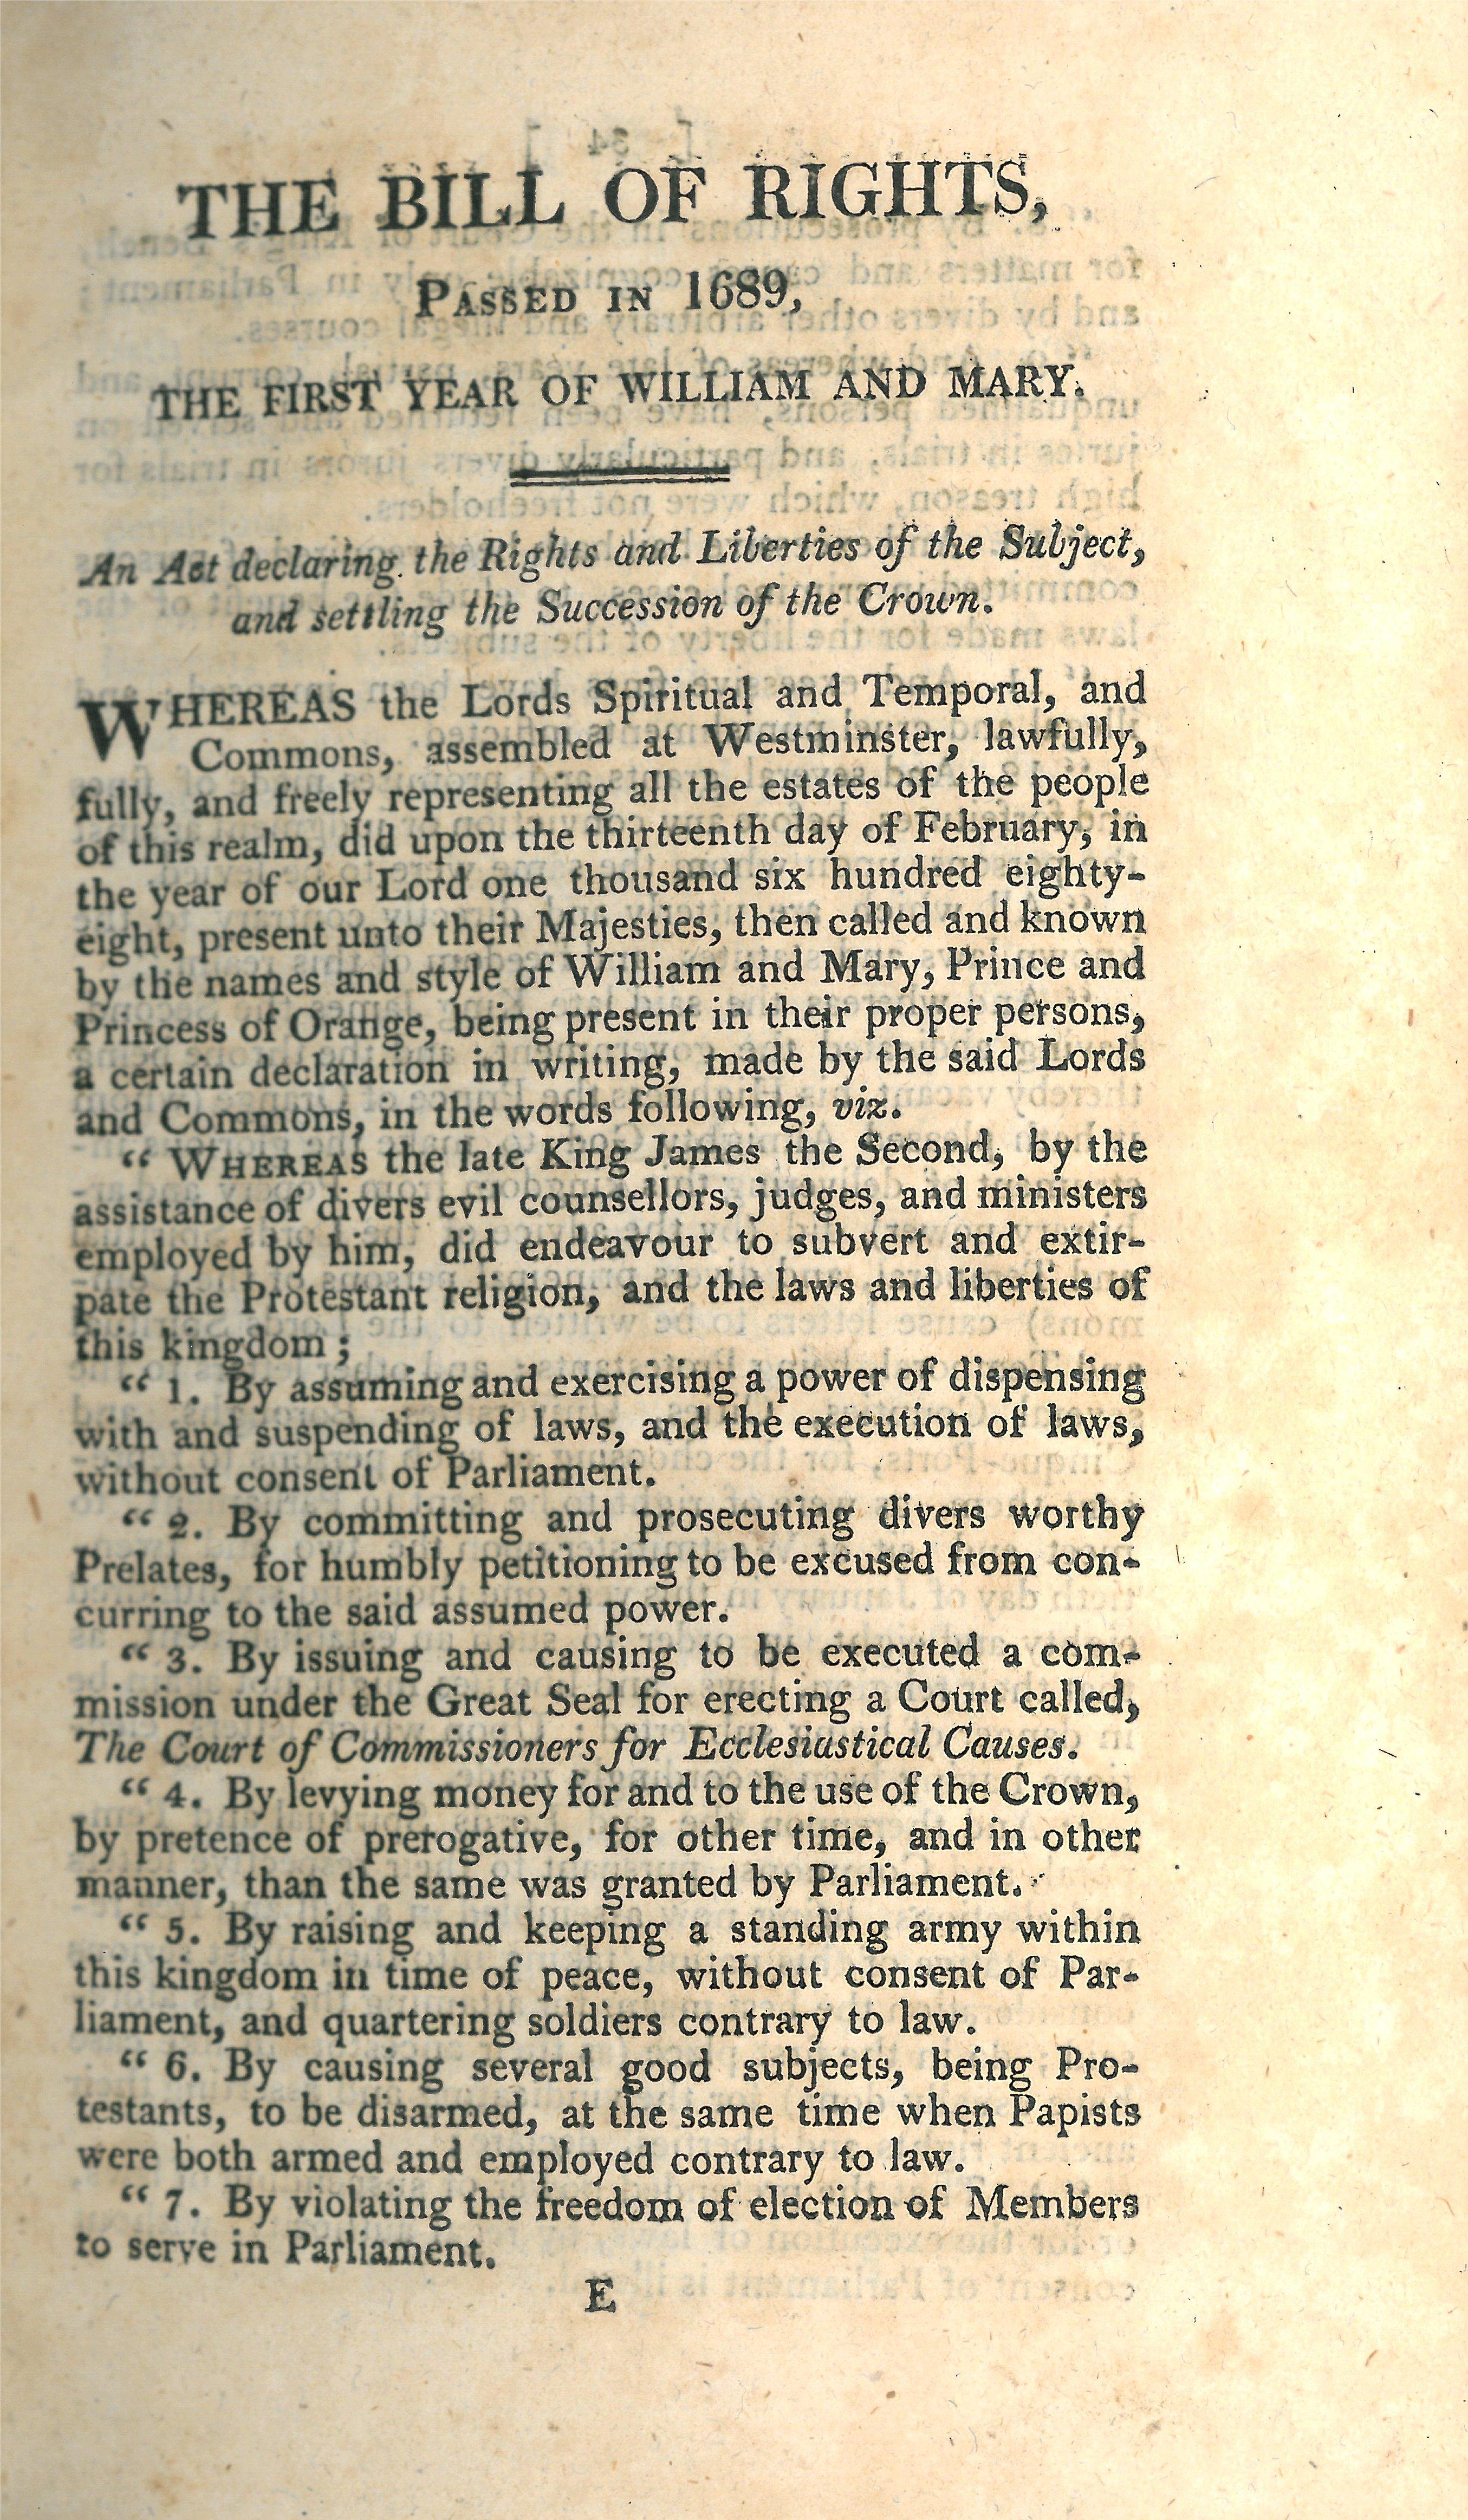 File Fairburn S Edition Of Magna Charta Bill Of